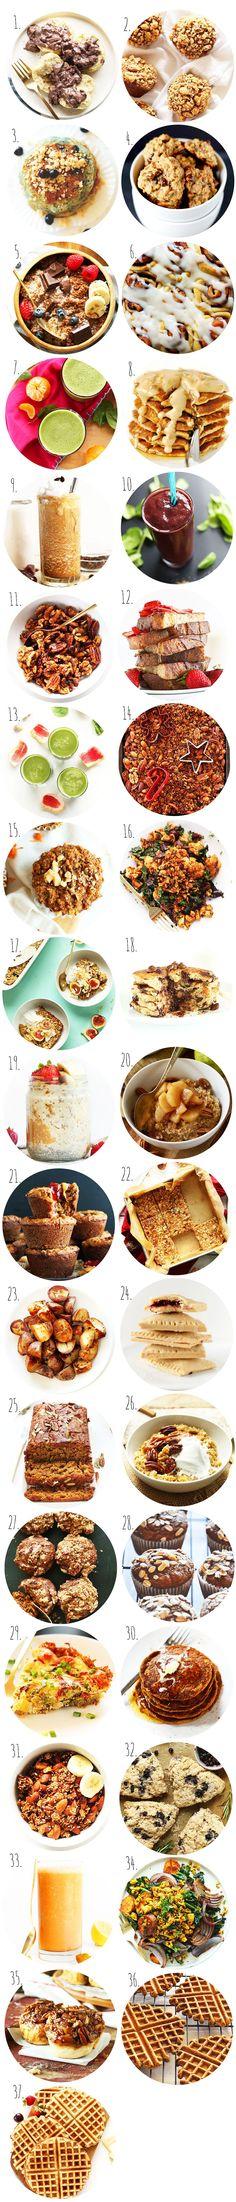 Plantbased Holiday Breakfast Recipes! #vegan #healthy #breakfast #minimalistbaker #christmas